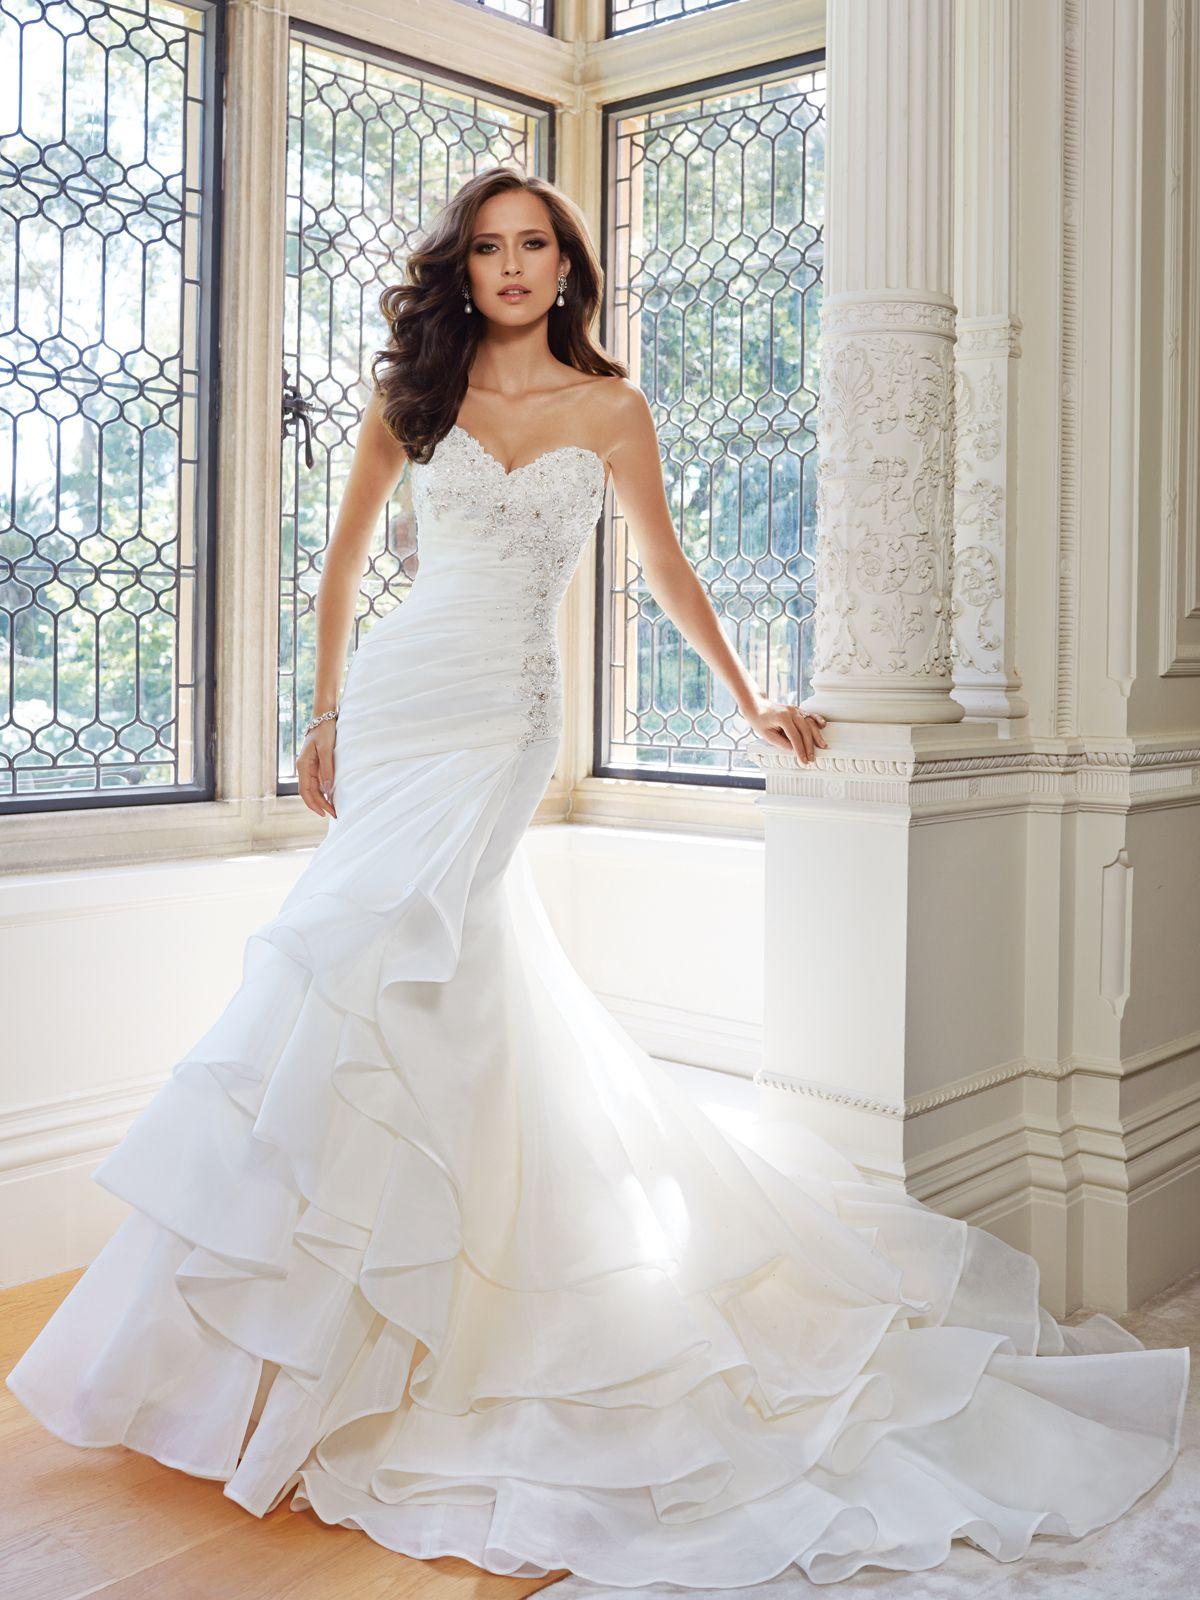 Mermaid ruffle wedding dress  Wedding Dresses  Collection u Ruffles of fantasy organza are the